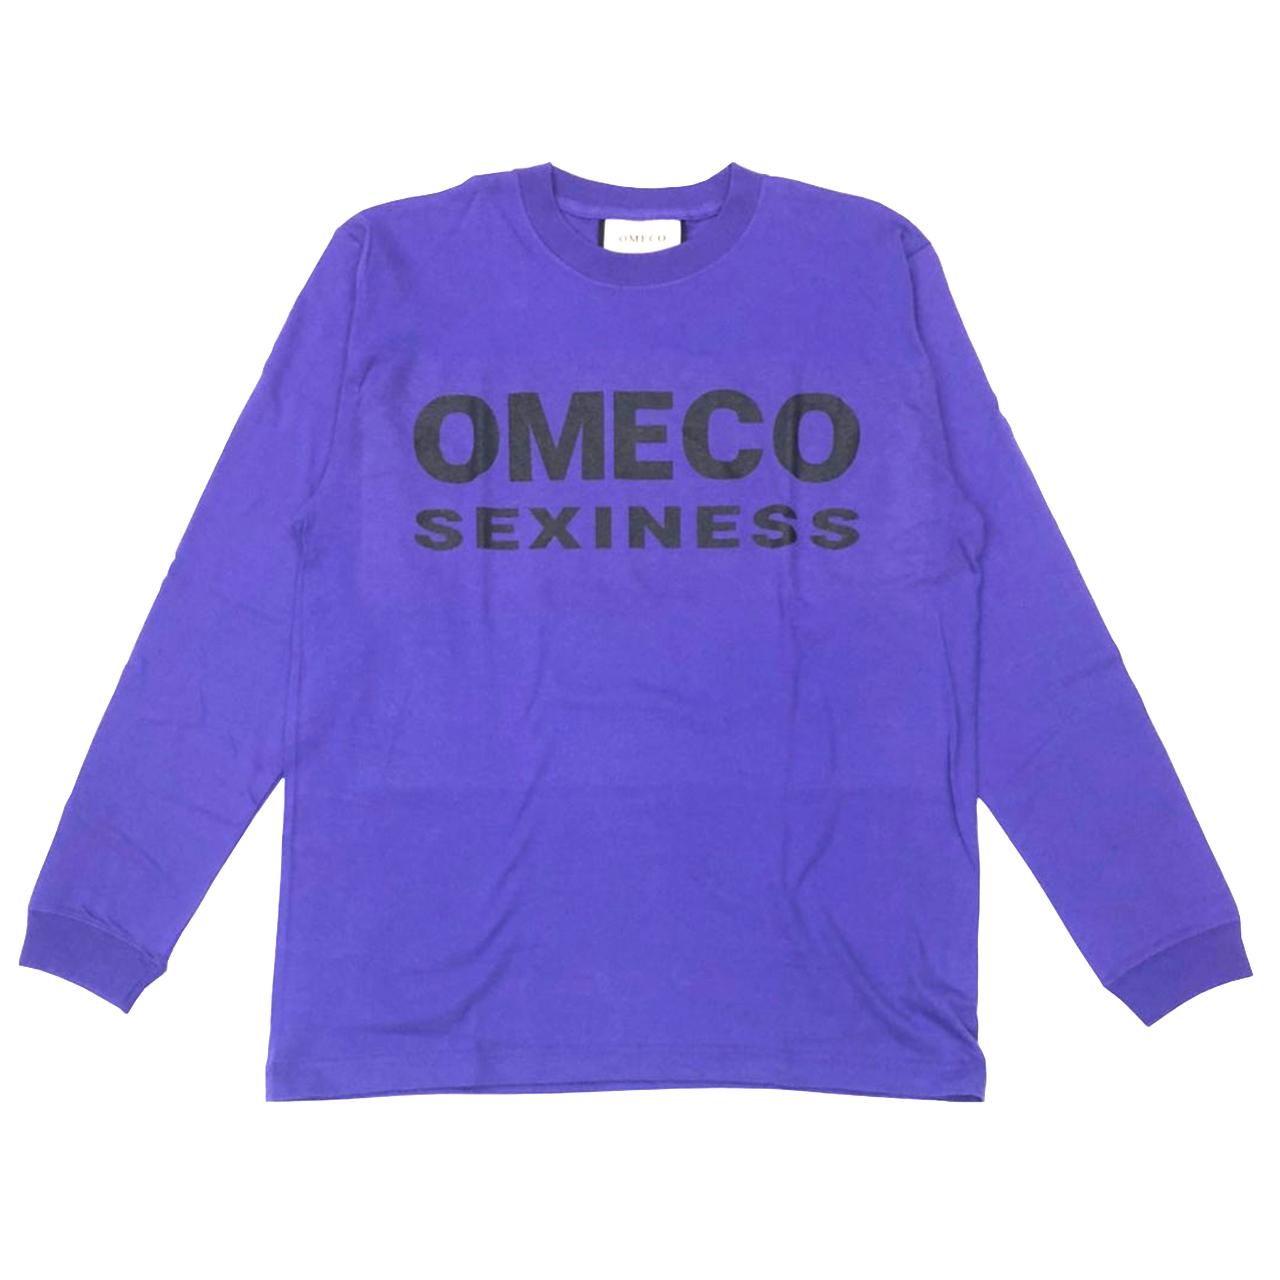 OMECO SEXINESS オメコ ロングスリーブTシャツ[送料全国一律0円]